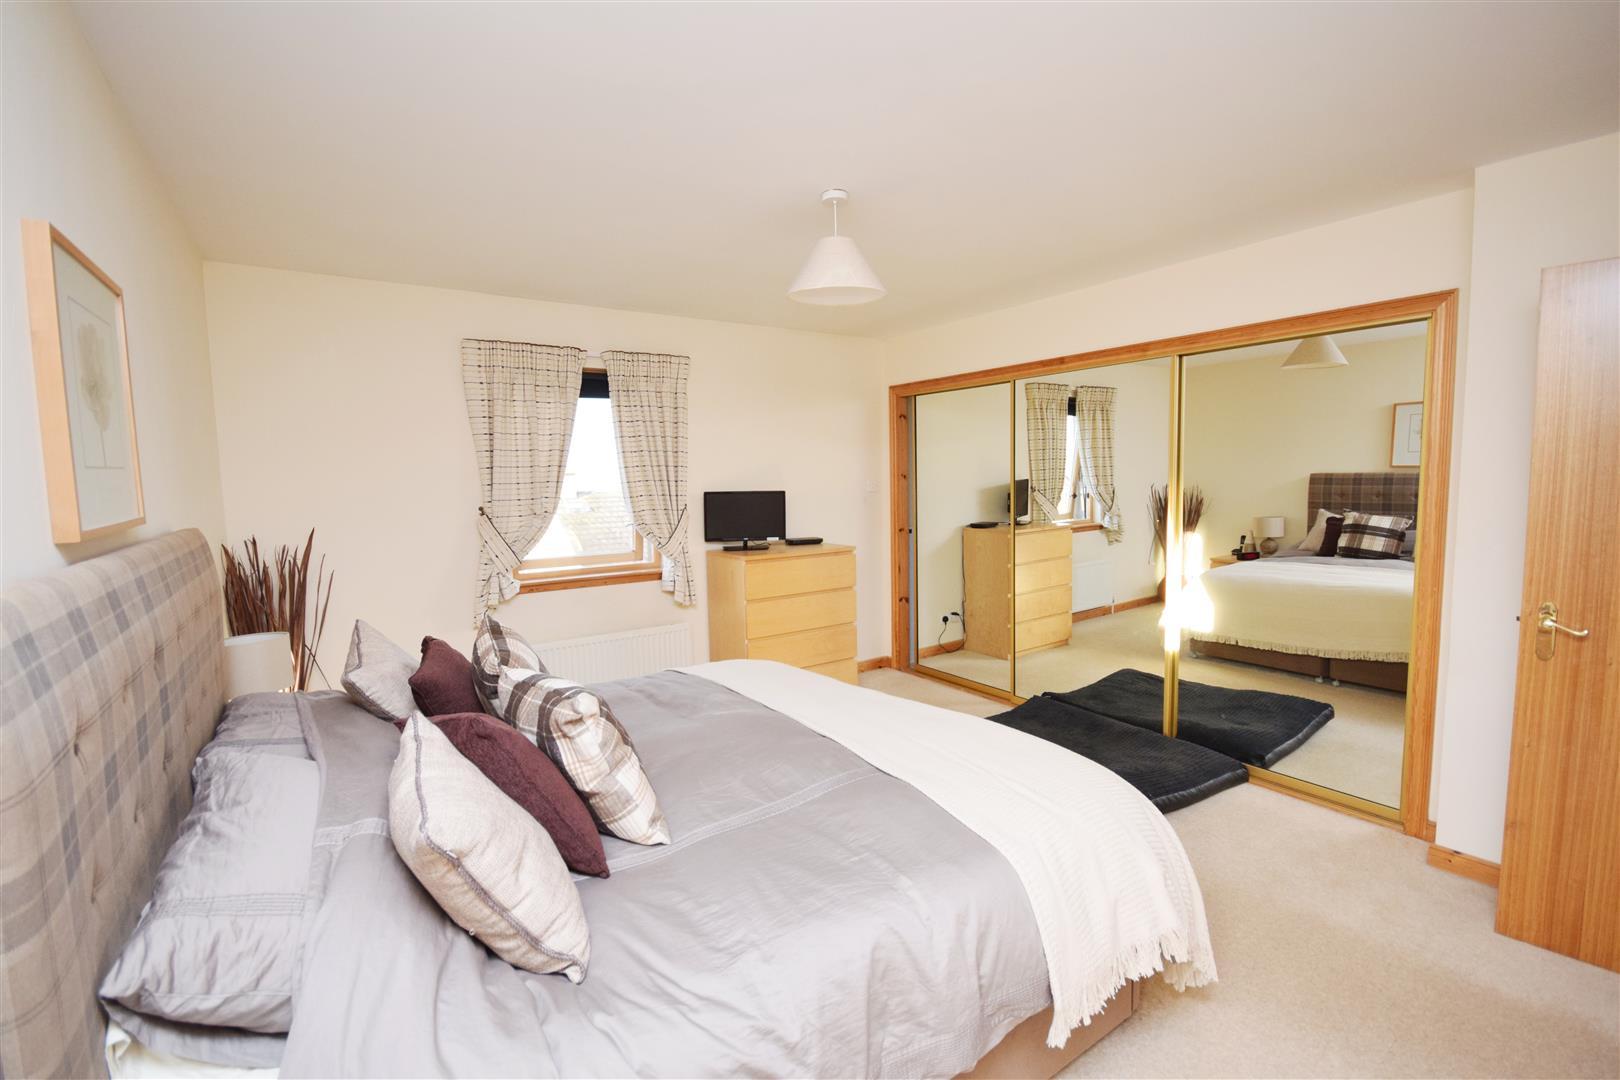 18, Brandywell Road, Abernethy, Perth, Perthshire, PH2 9GY, UK